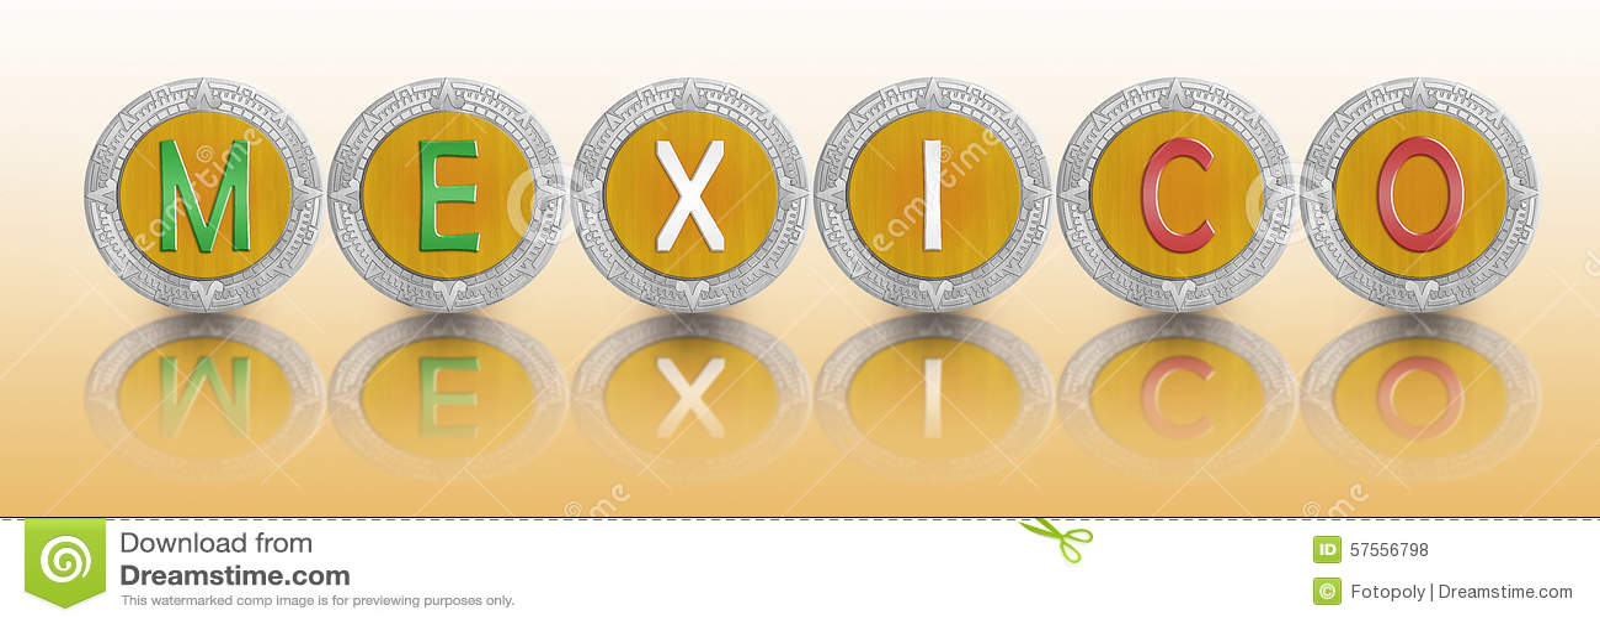 Mexican Peso Stock Illustration Illustration Of Economy 57556798